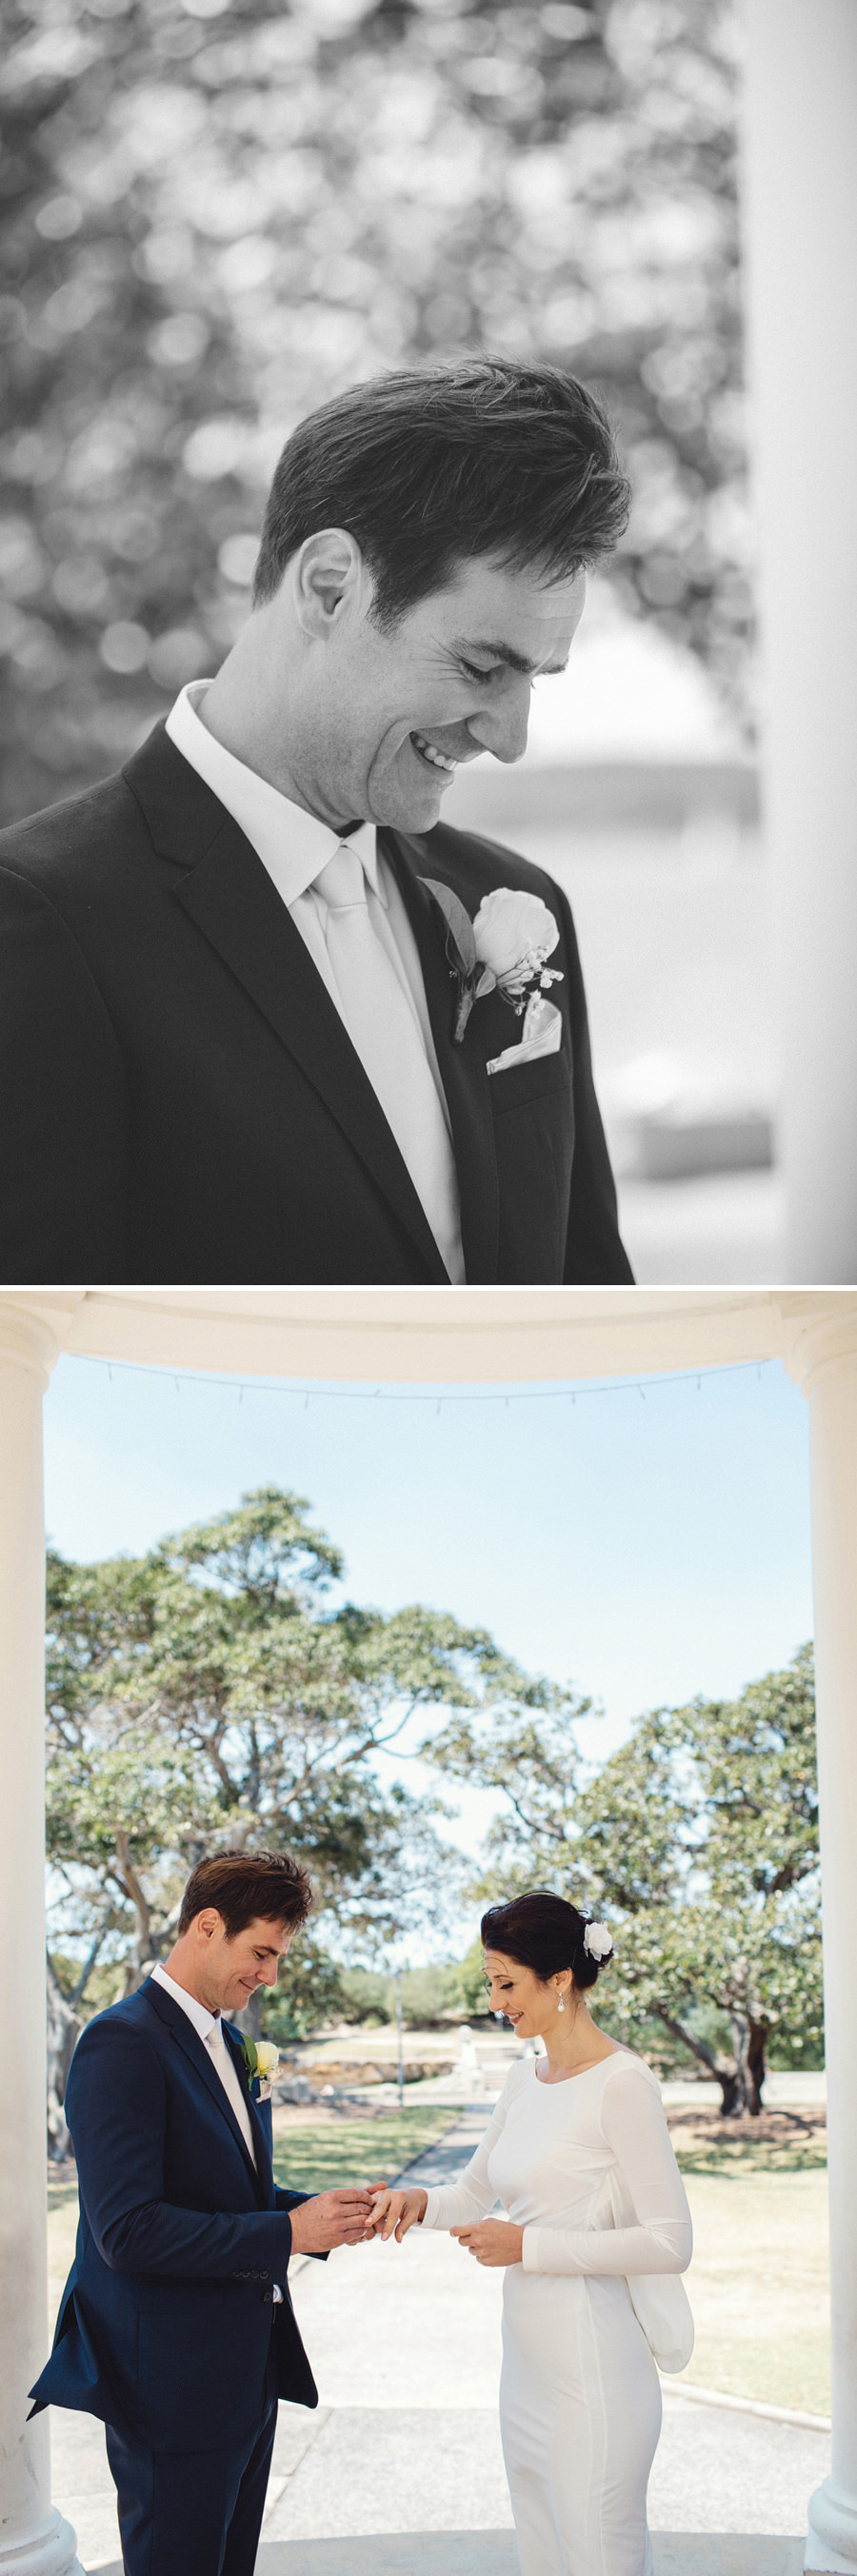 Mosman Wedding Photographer: Ceremony